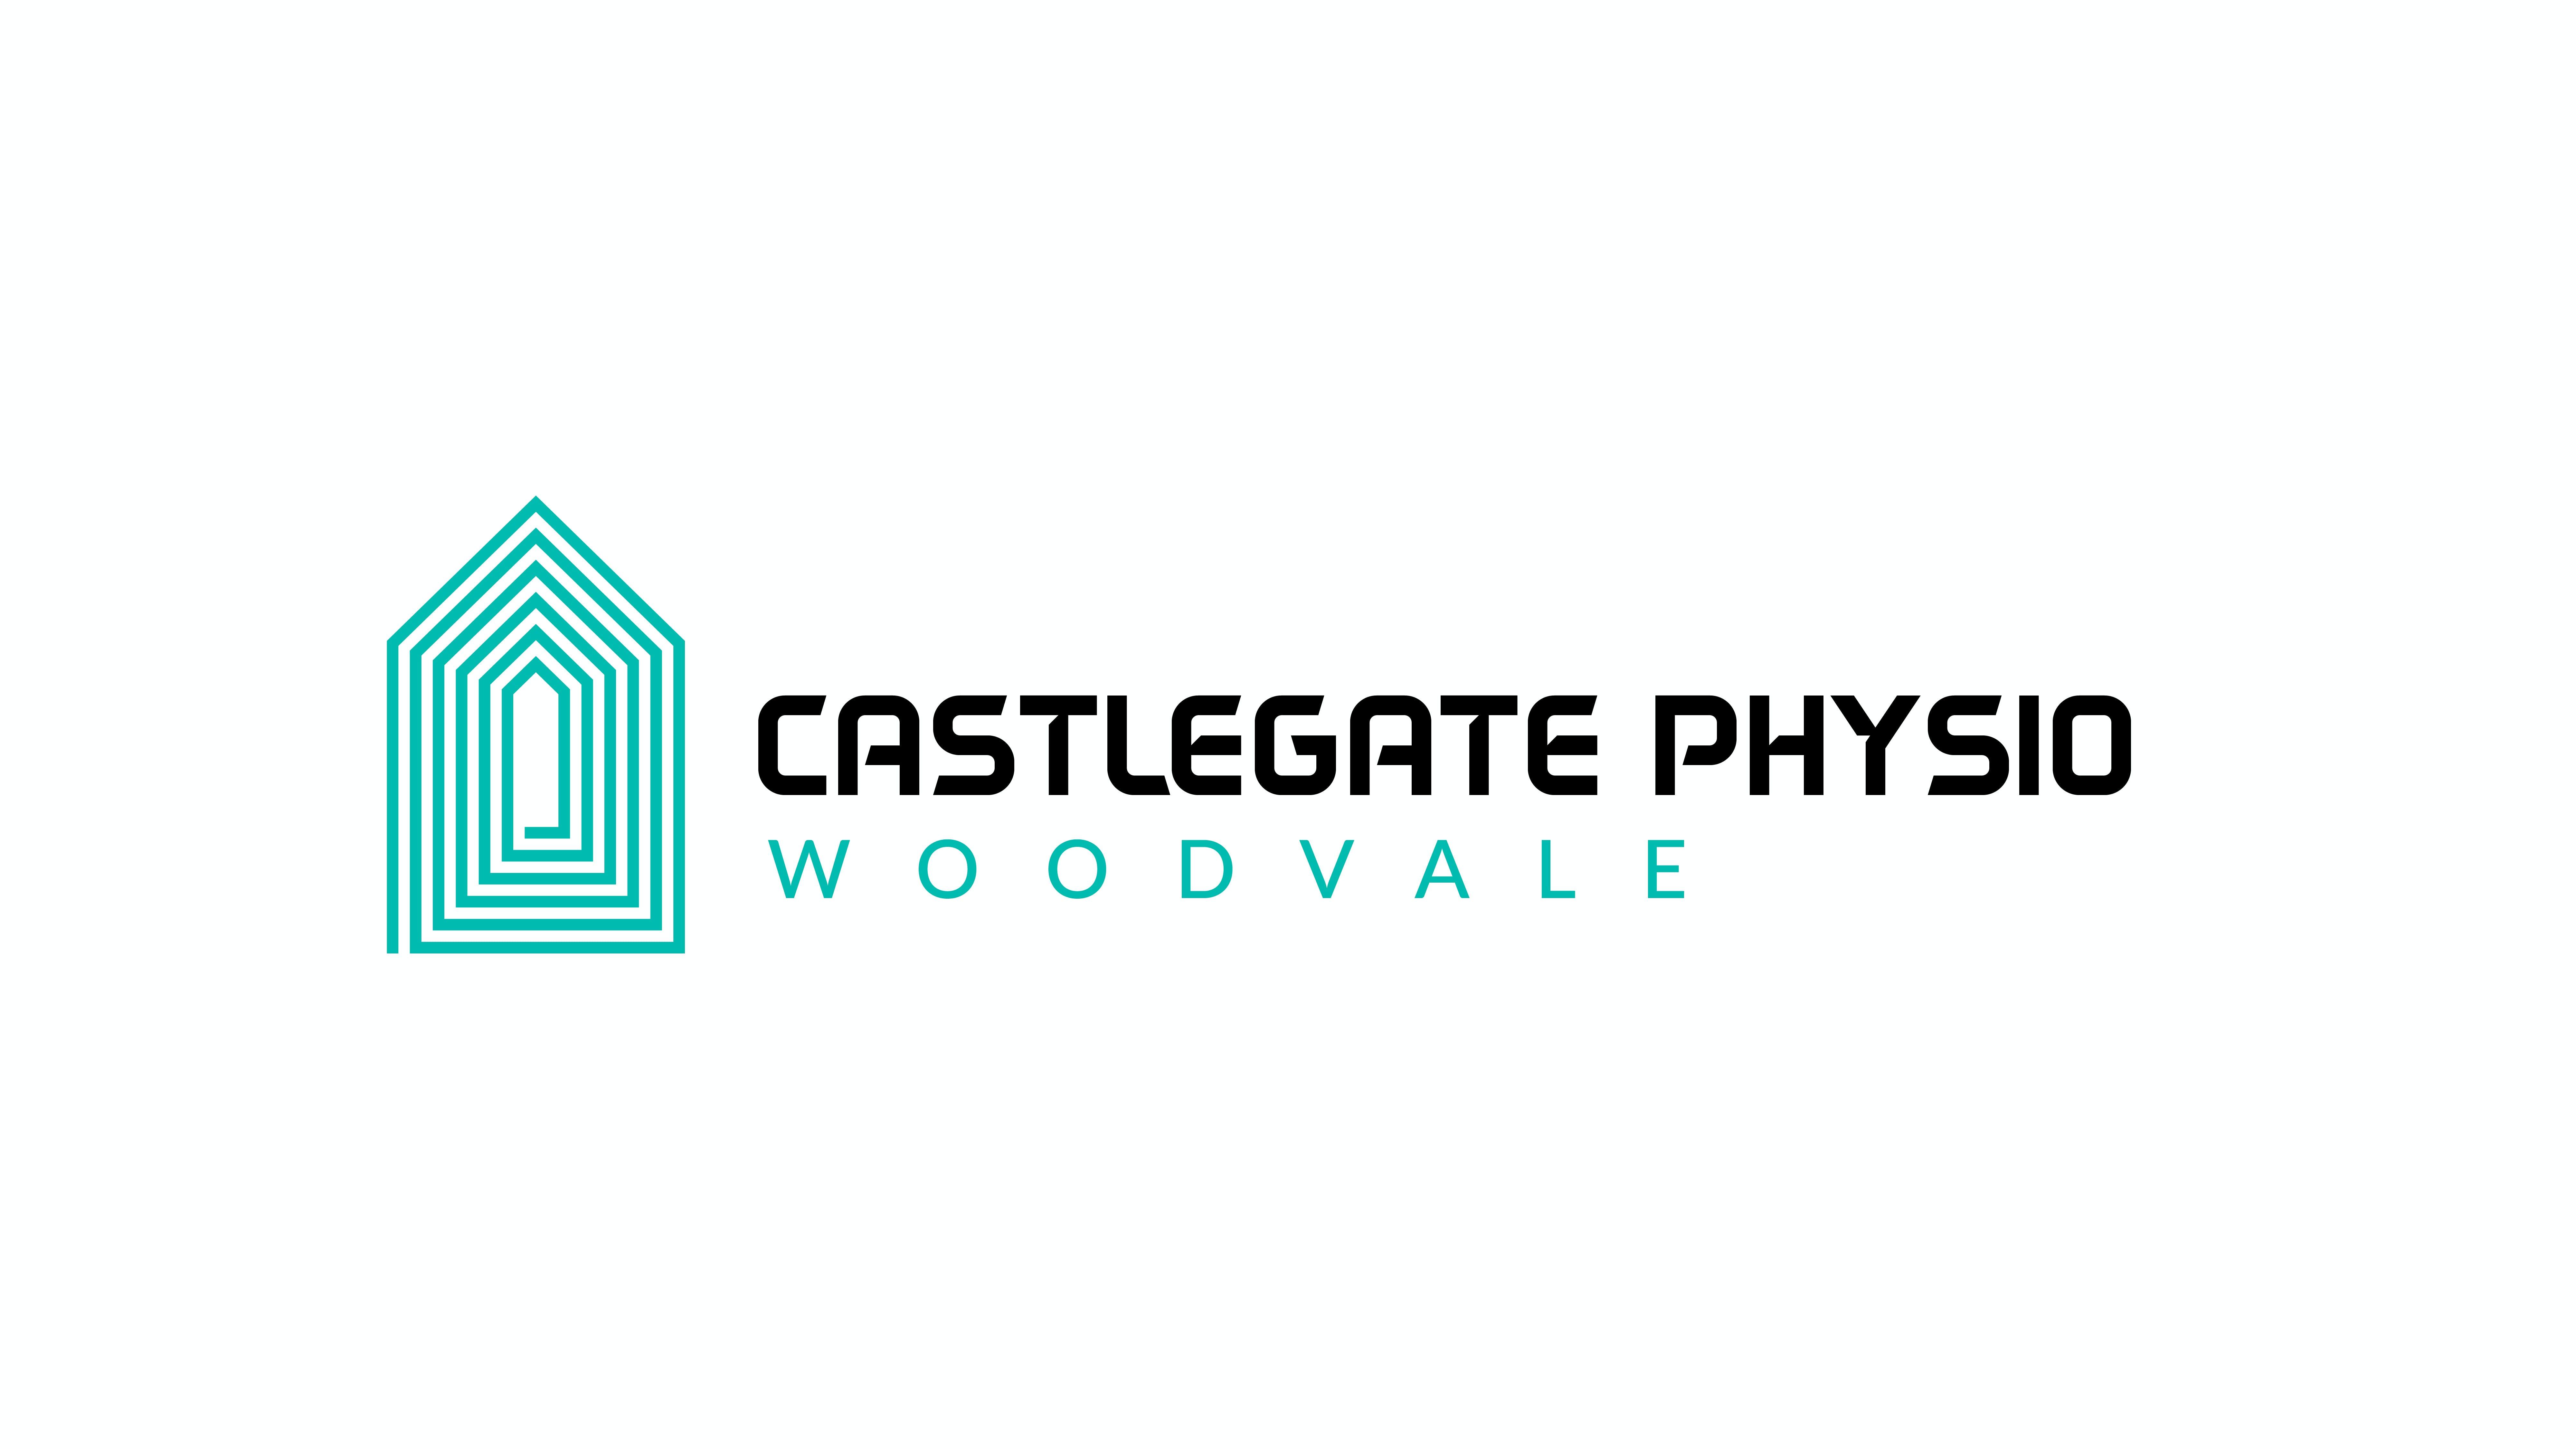 Castlegate Physio Woodvale Logo